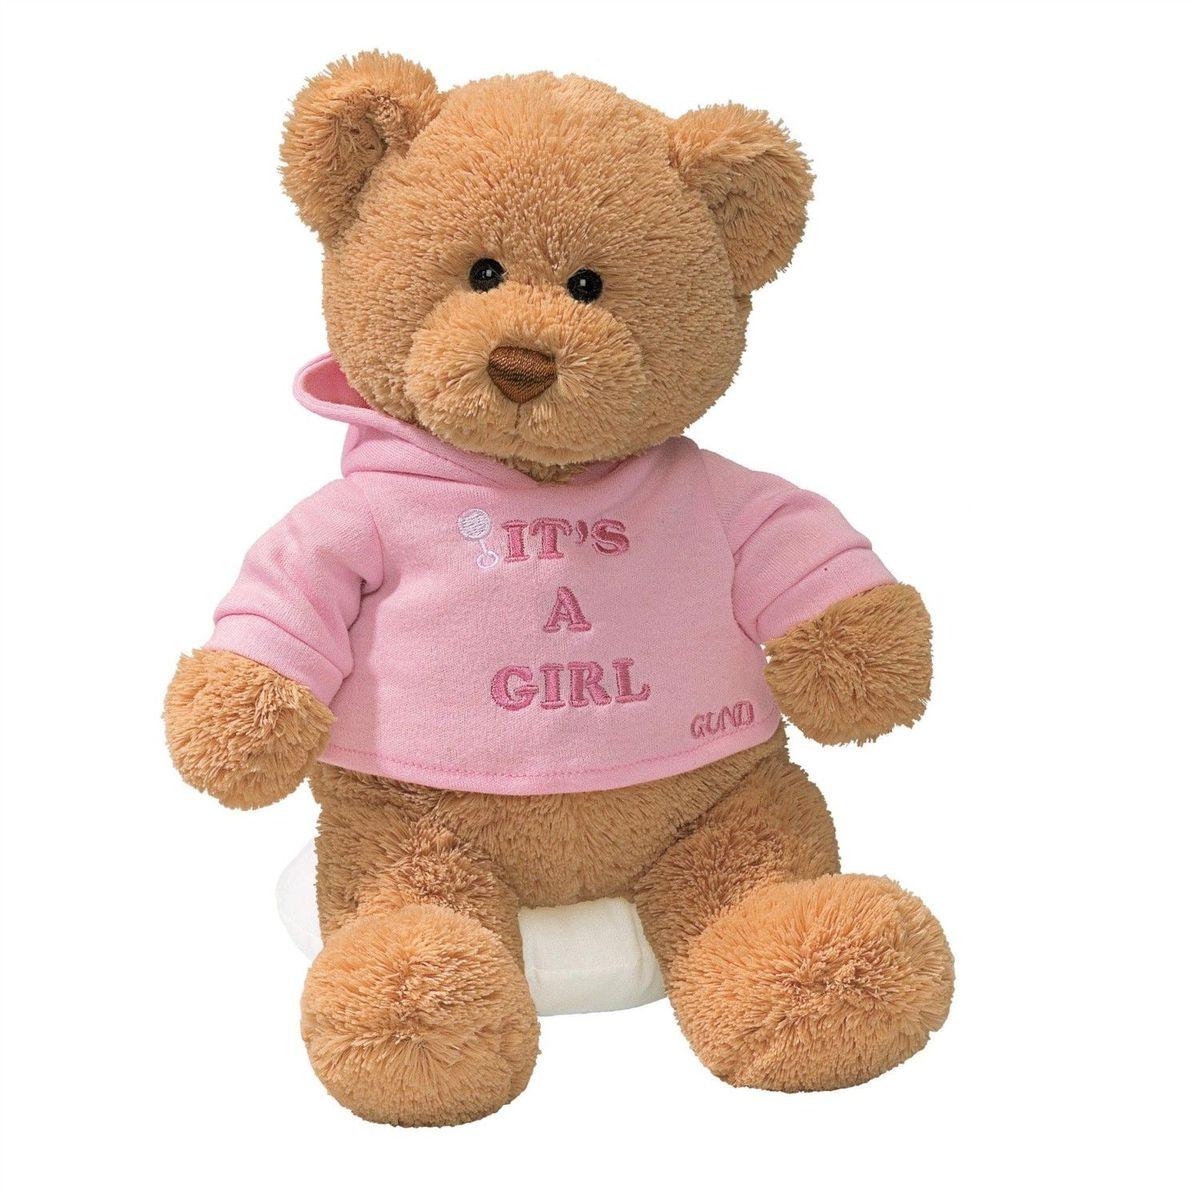 Gund Мягкая игрушка It's a girl 30 см gund мягкая игрушка perry bear 40 5 см